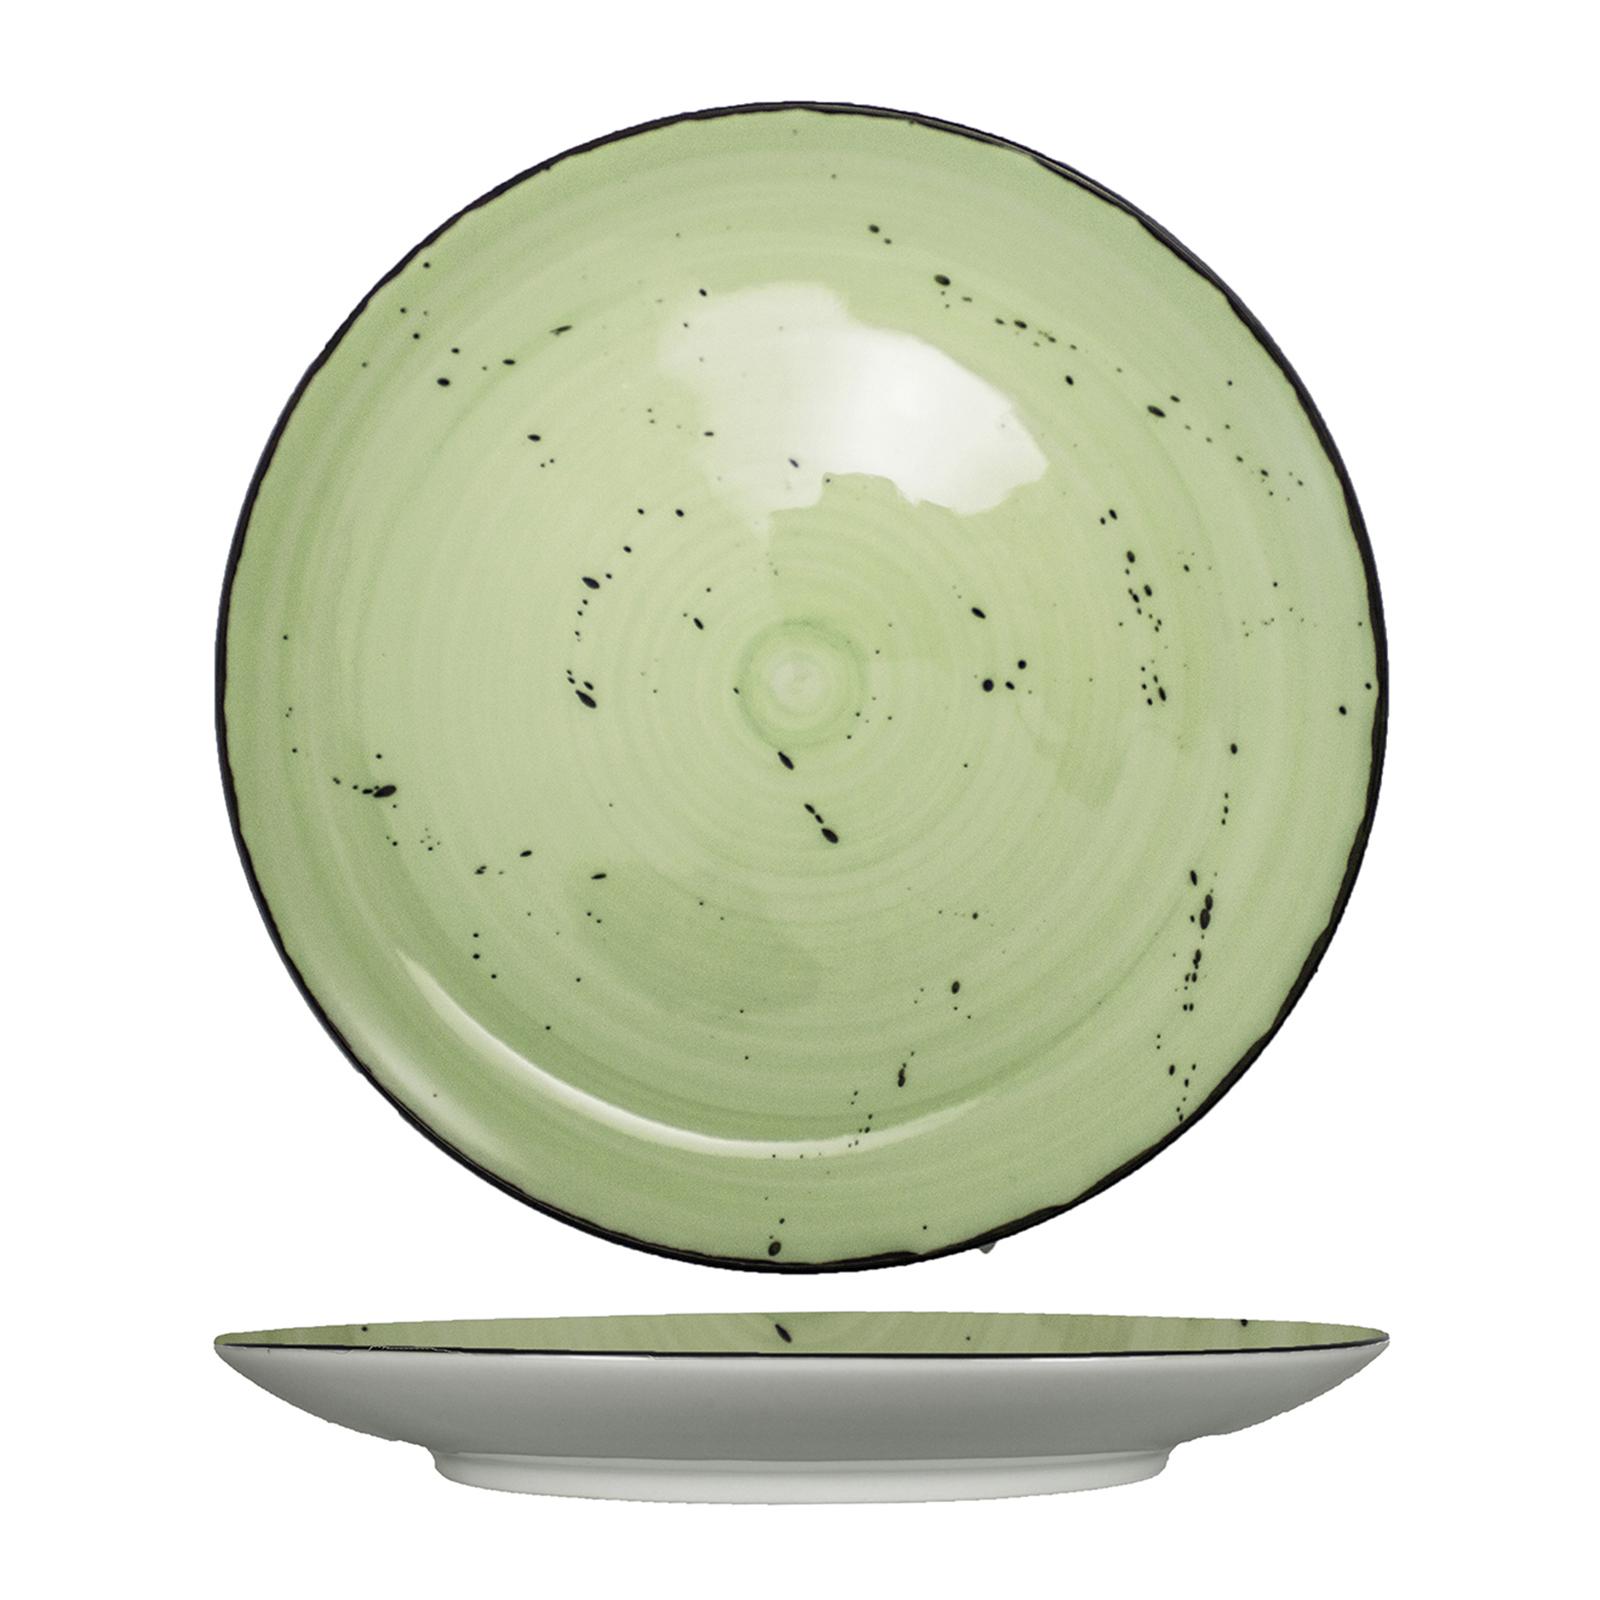 International Tableware RT-5-LI plate, china